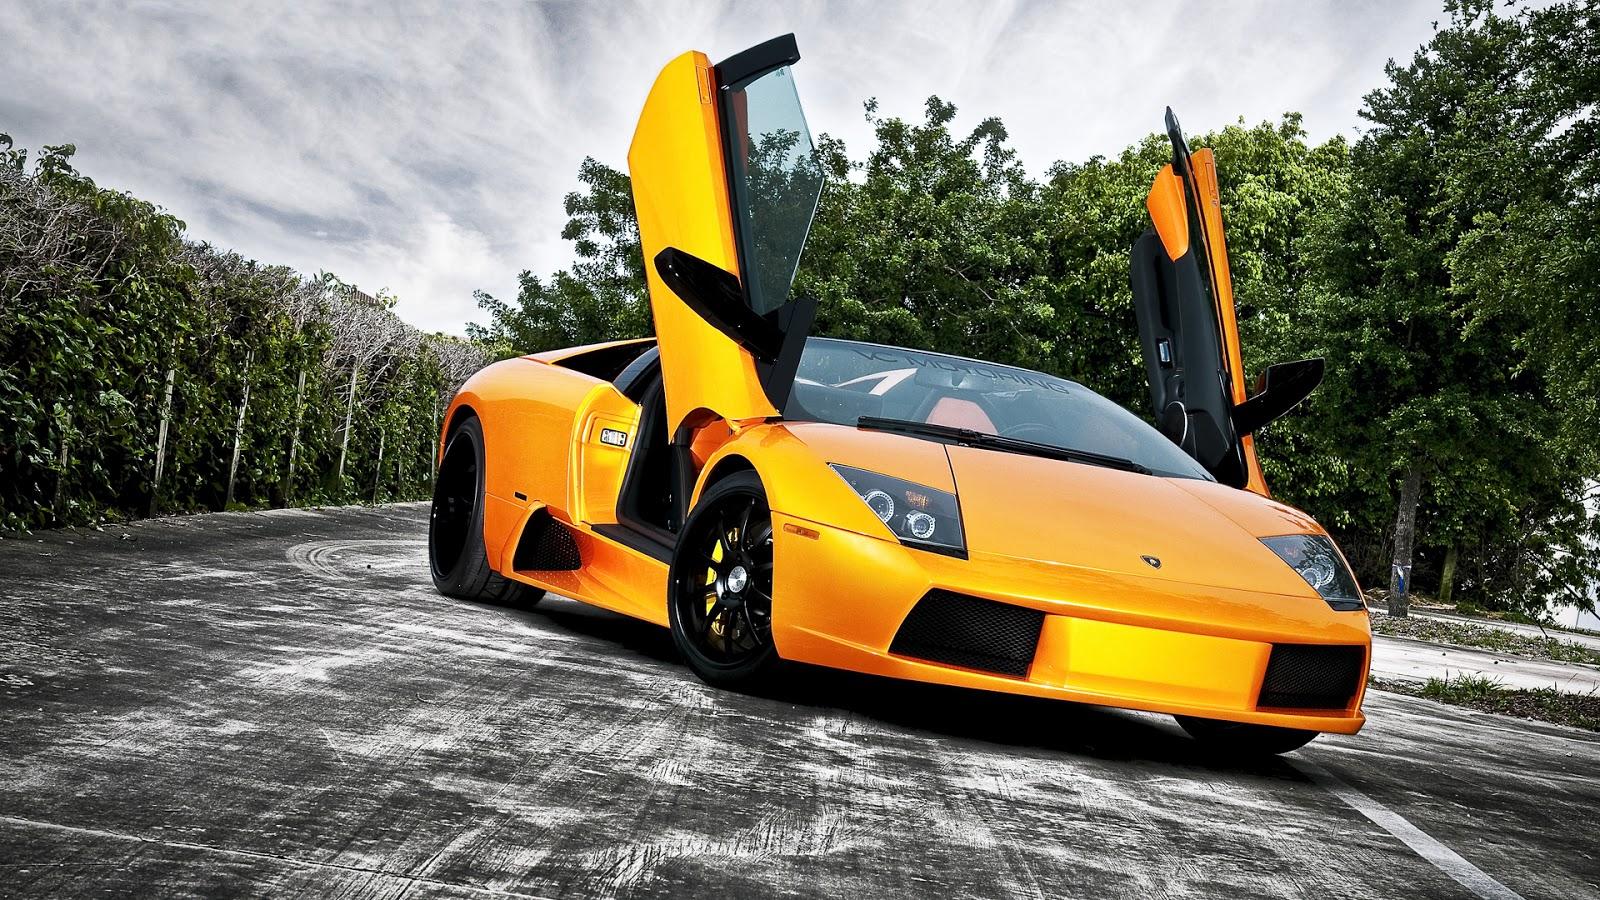 Stylish Yellow Lamborghini Car Wallpaper